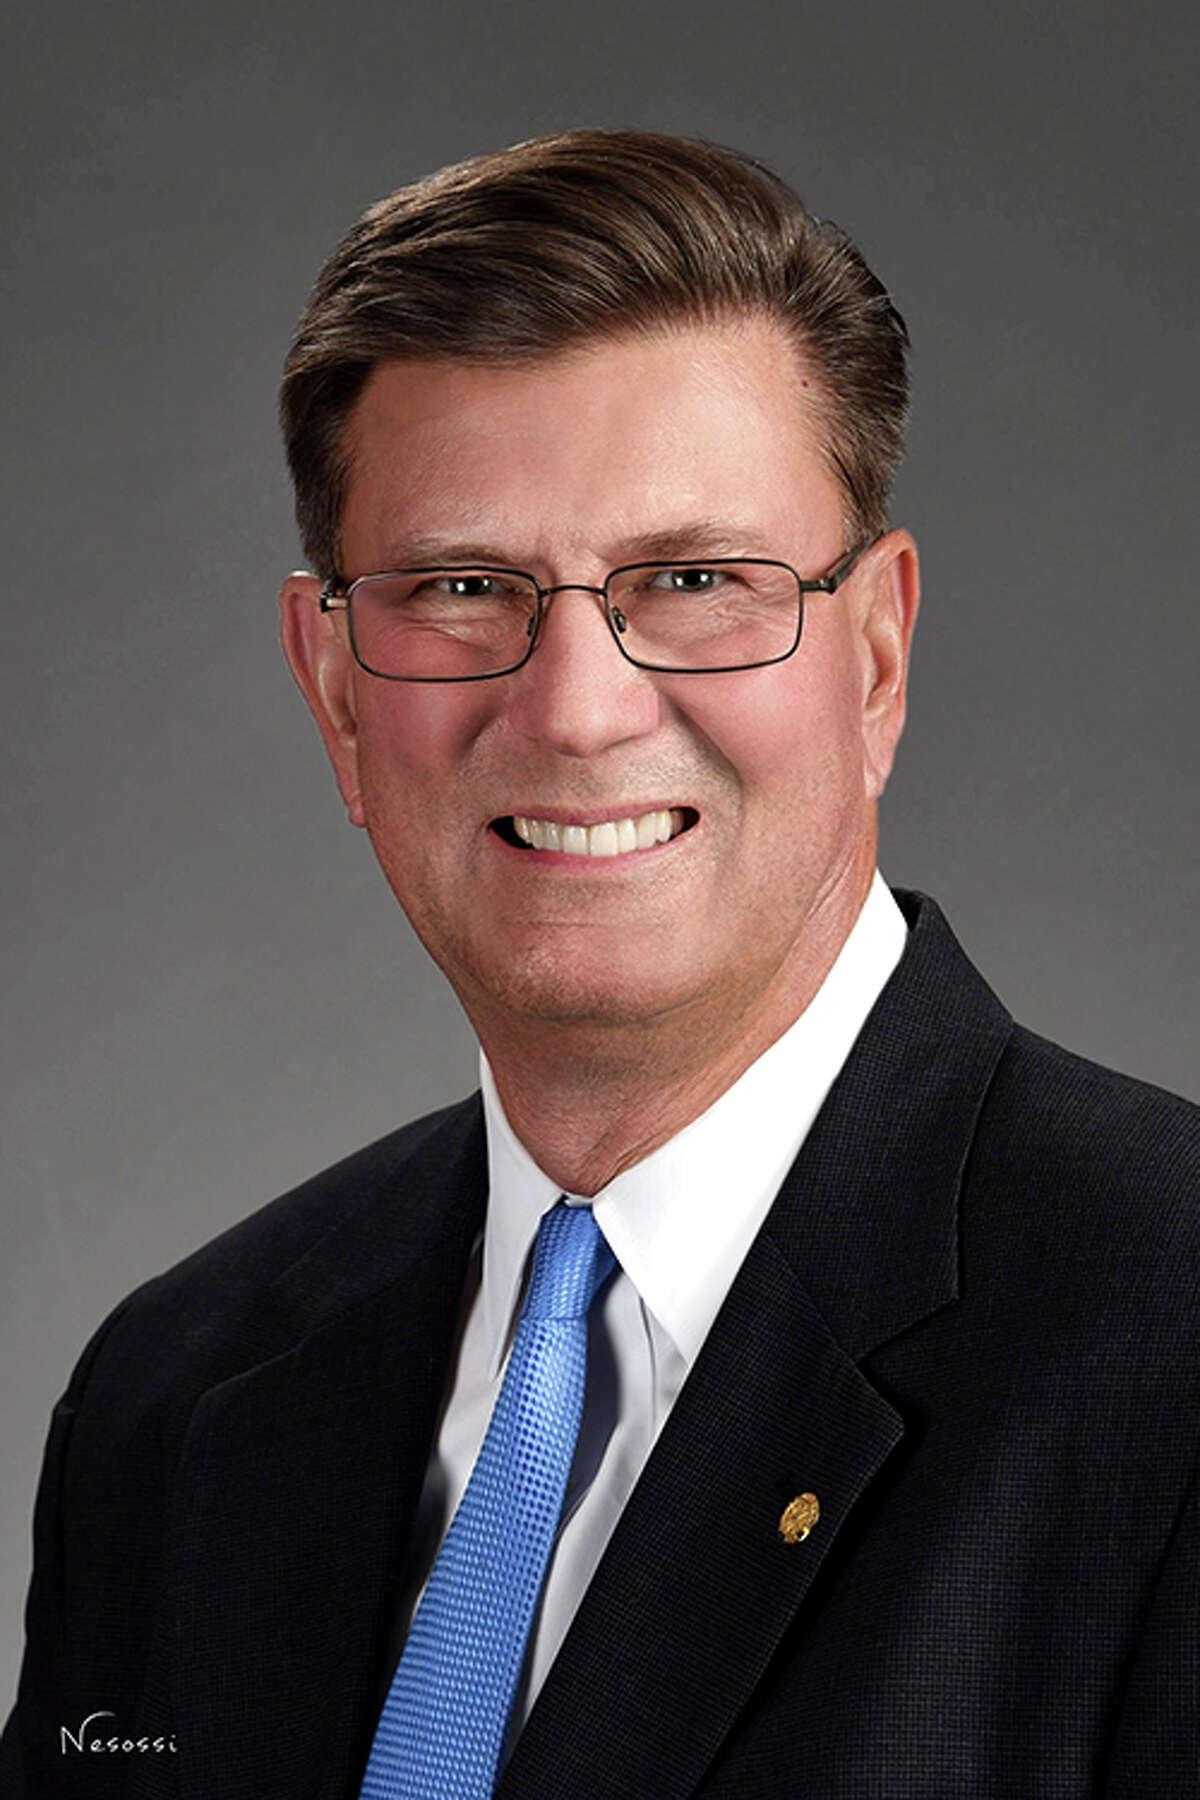 Sugar Land Mayor Joe Zimmerman